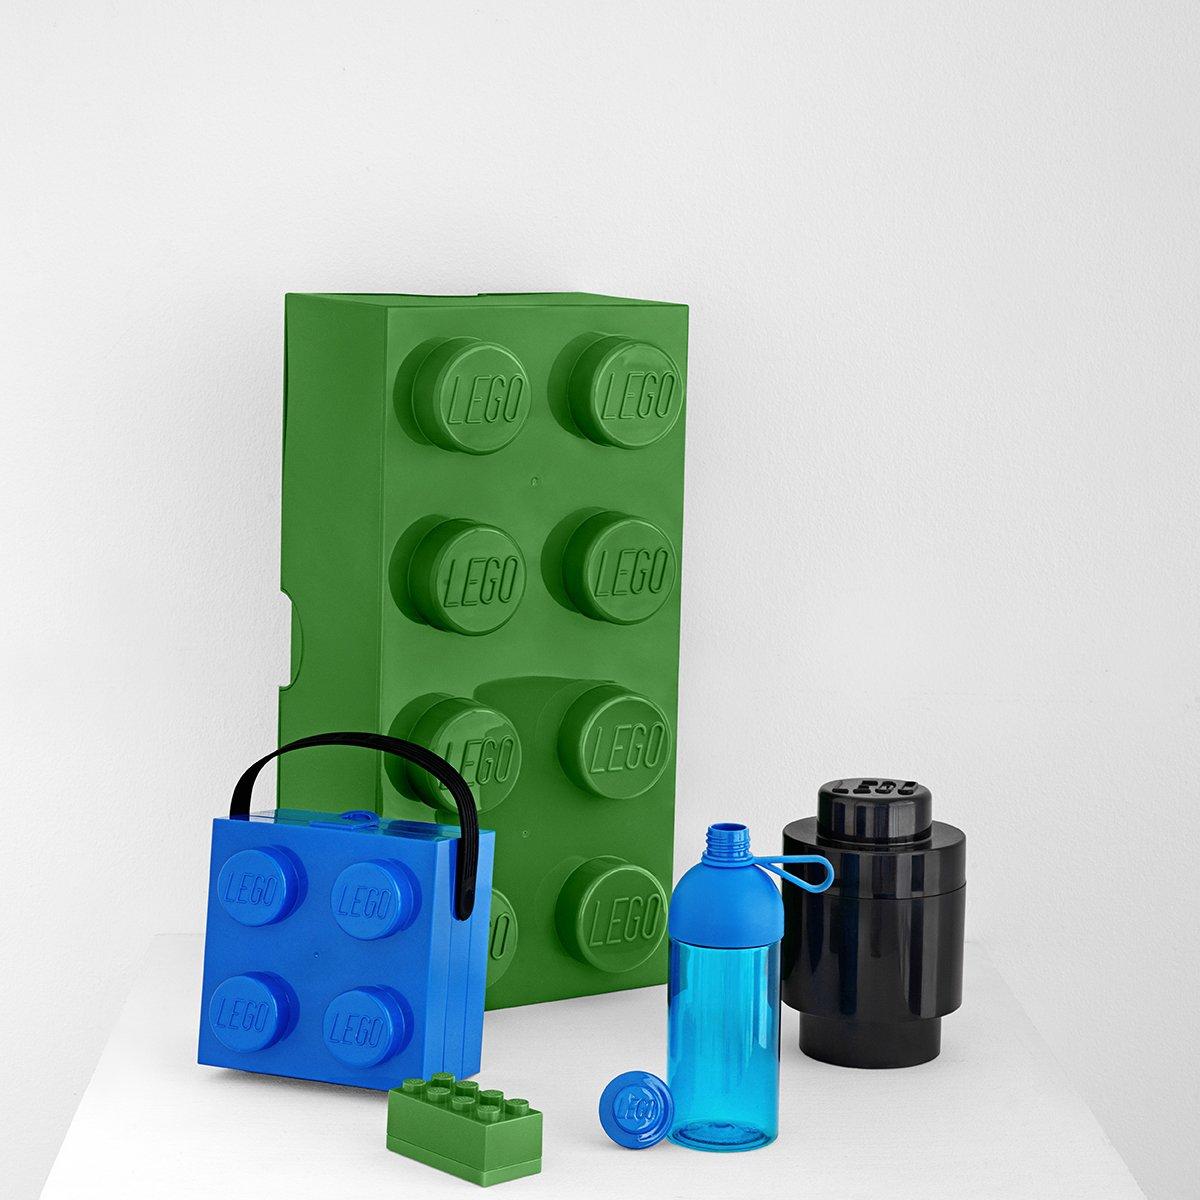 Gourde LEGO Remplir de gla/çons rouge gourde transparente 740 ml